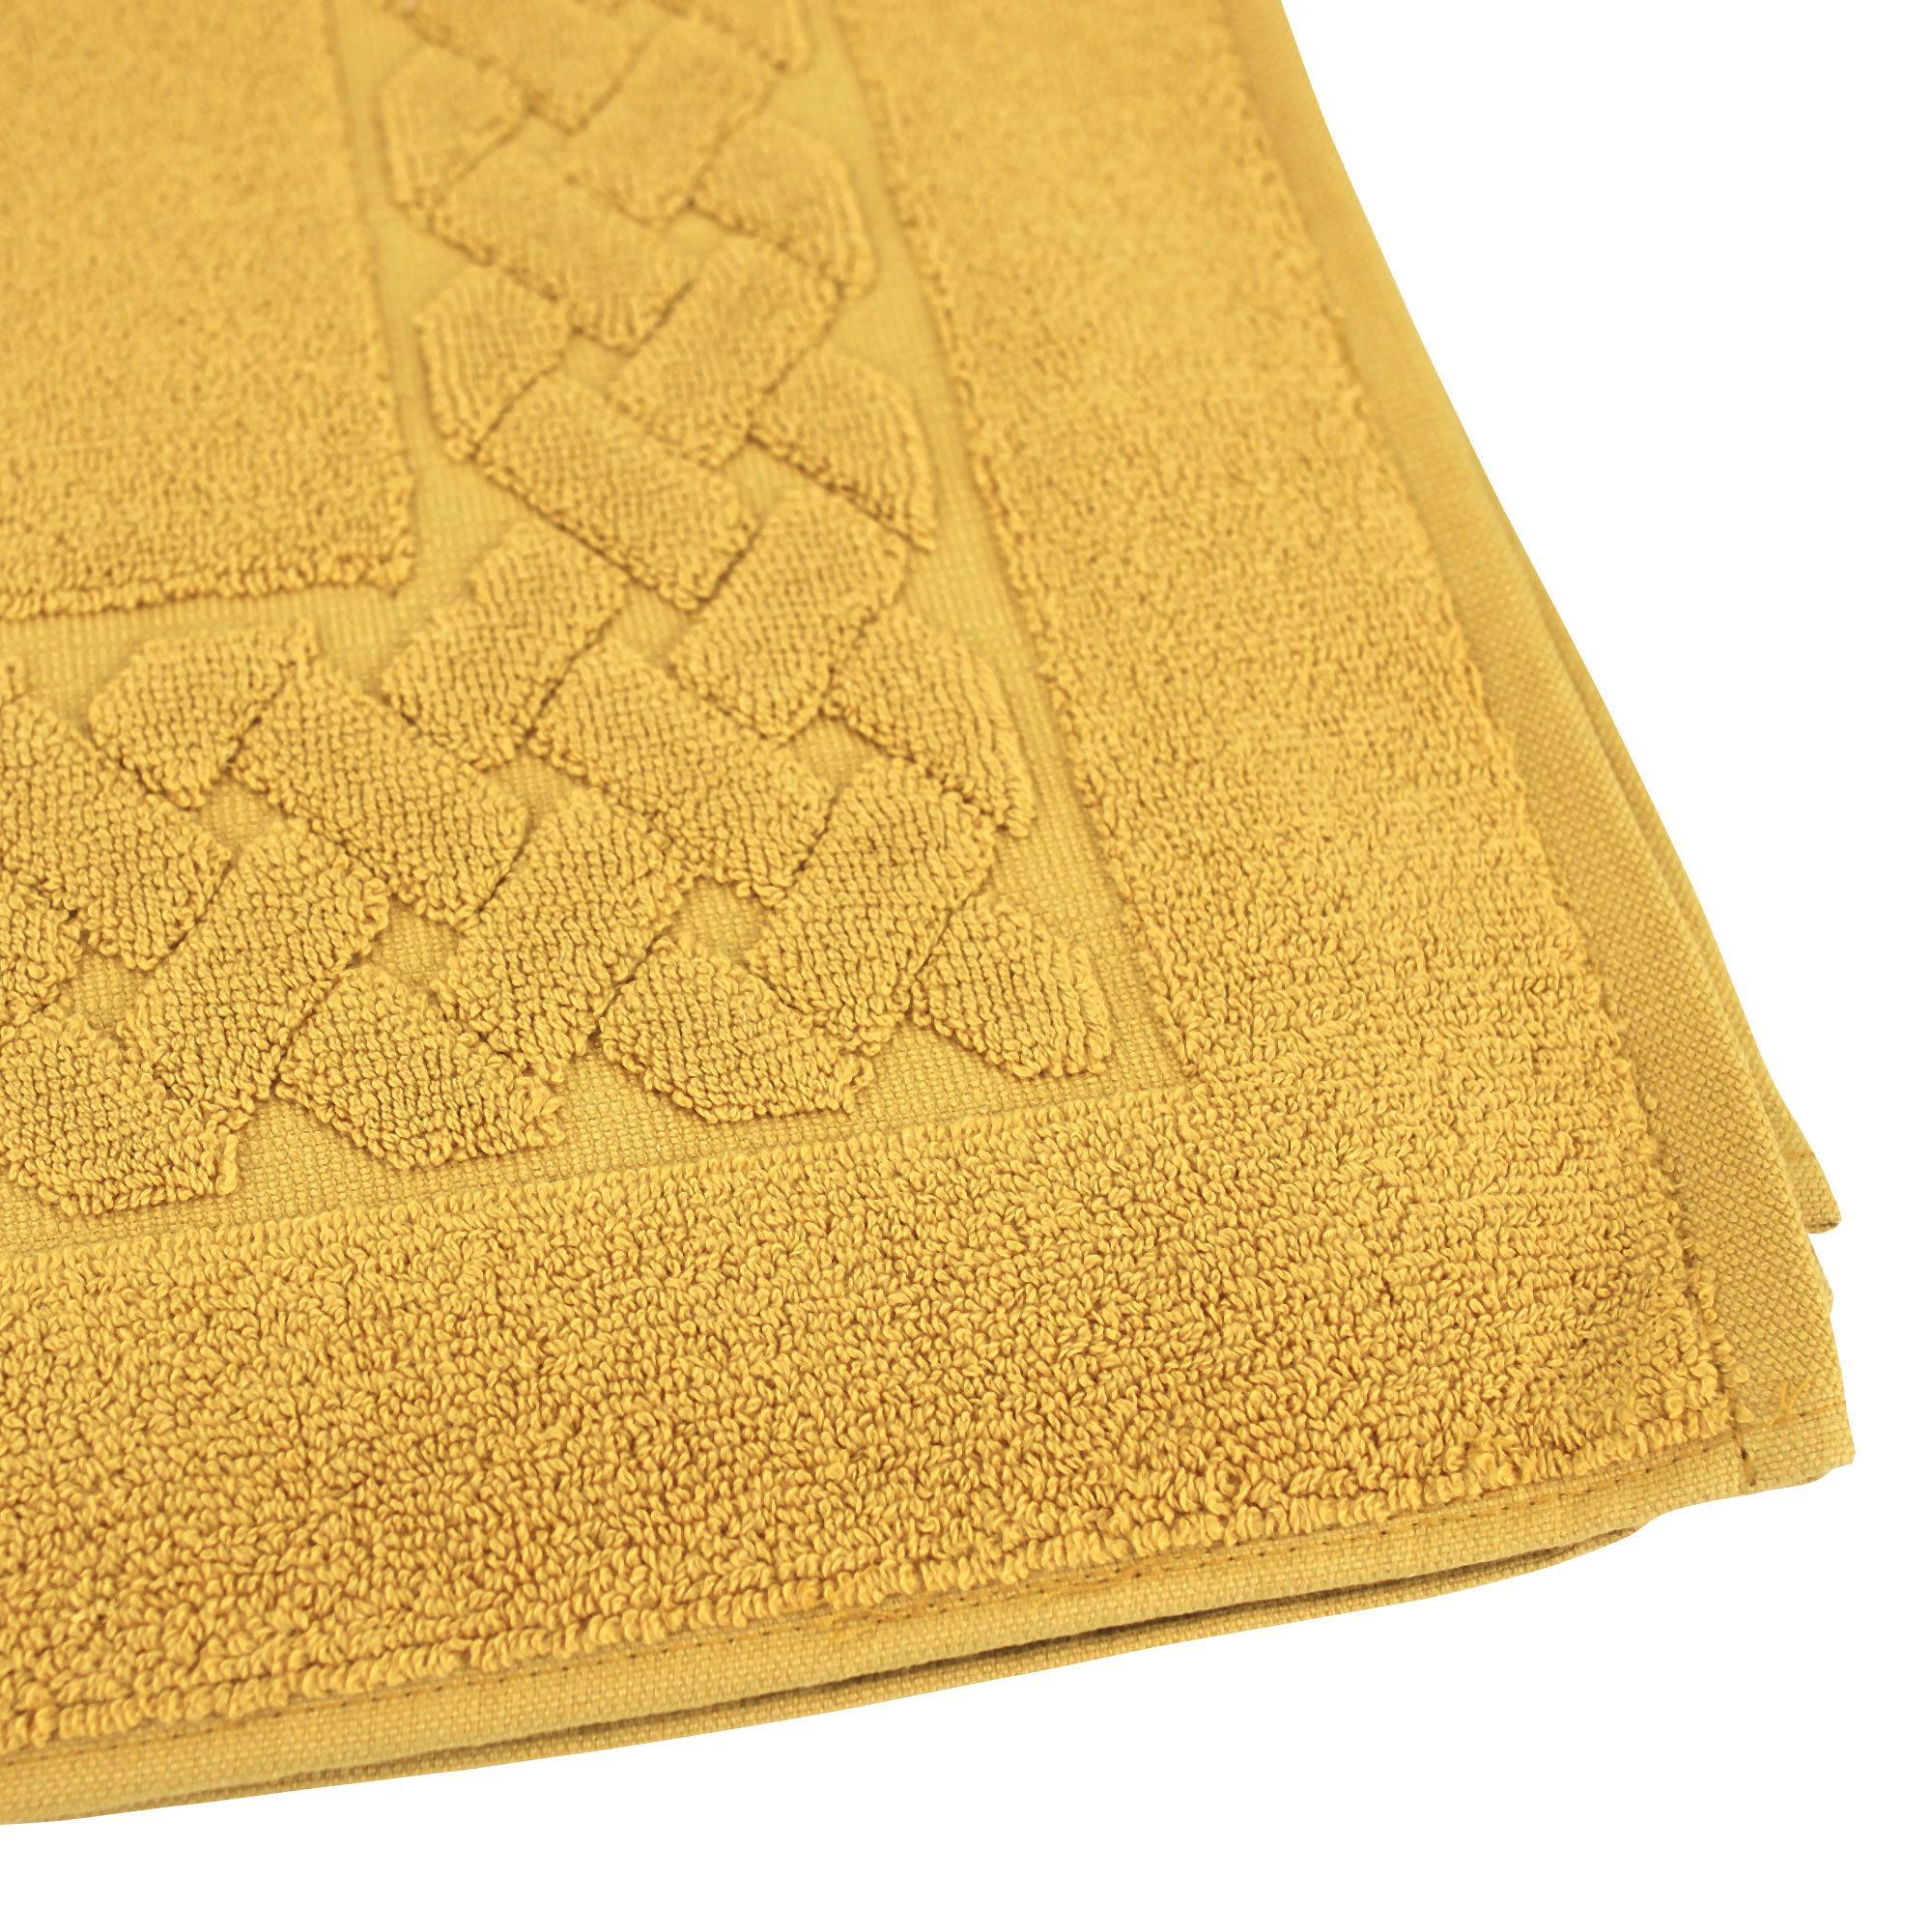 tapis de bain 50x80 coton uni royal cresent jaune quartz. Black Bedroom Furniture Sets. Home Design Ideas